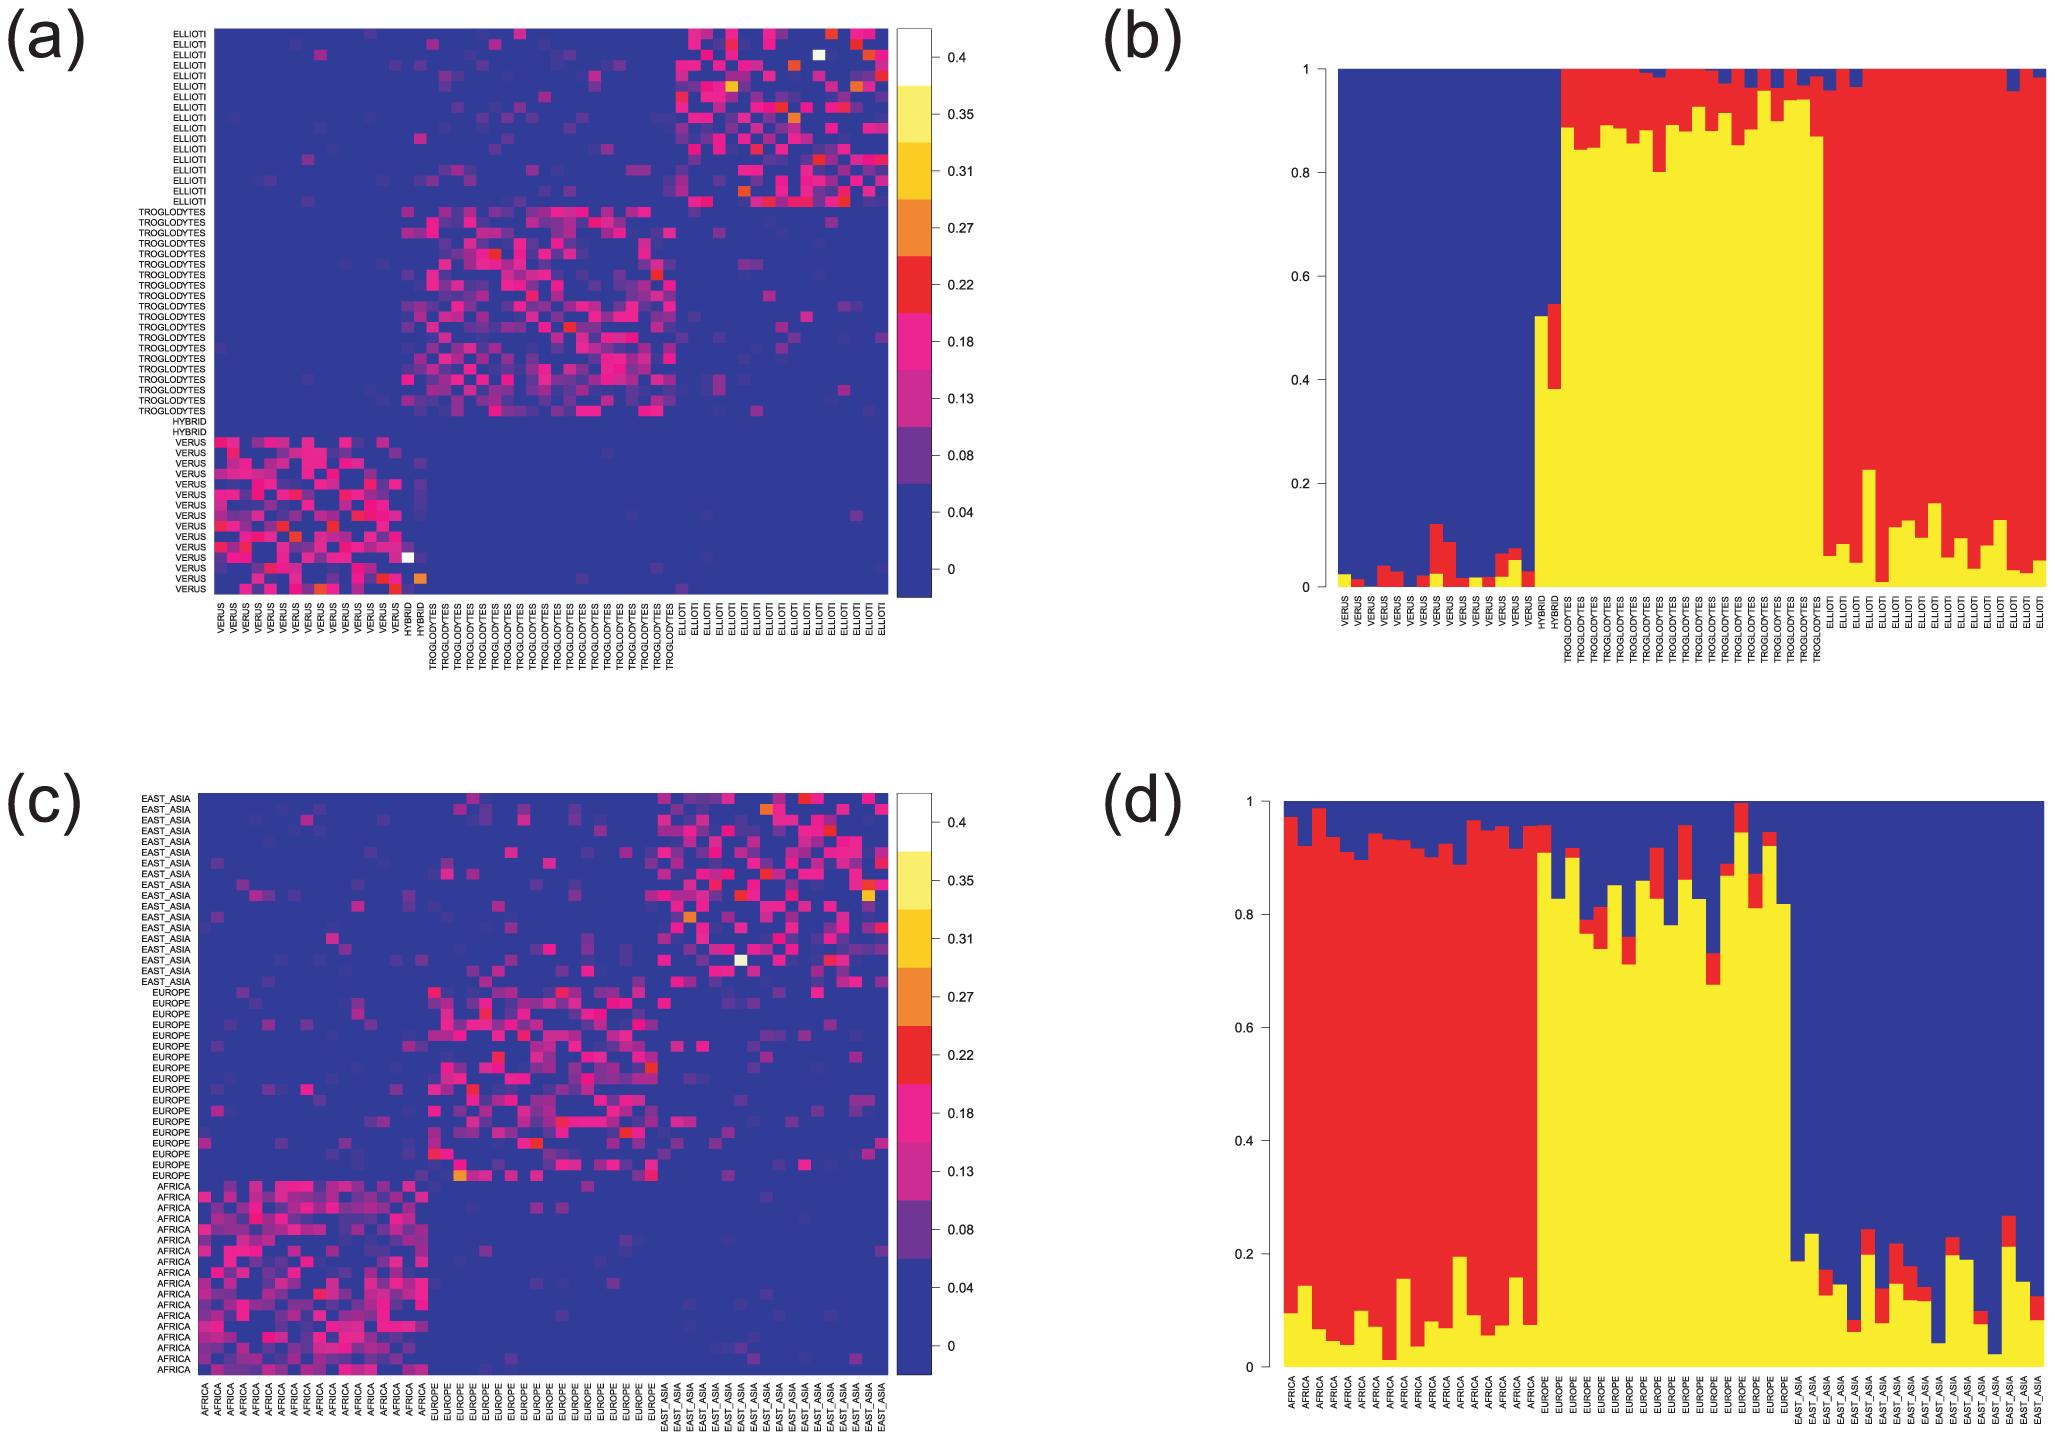 Haplotype-based analyses of population relationships.